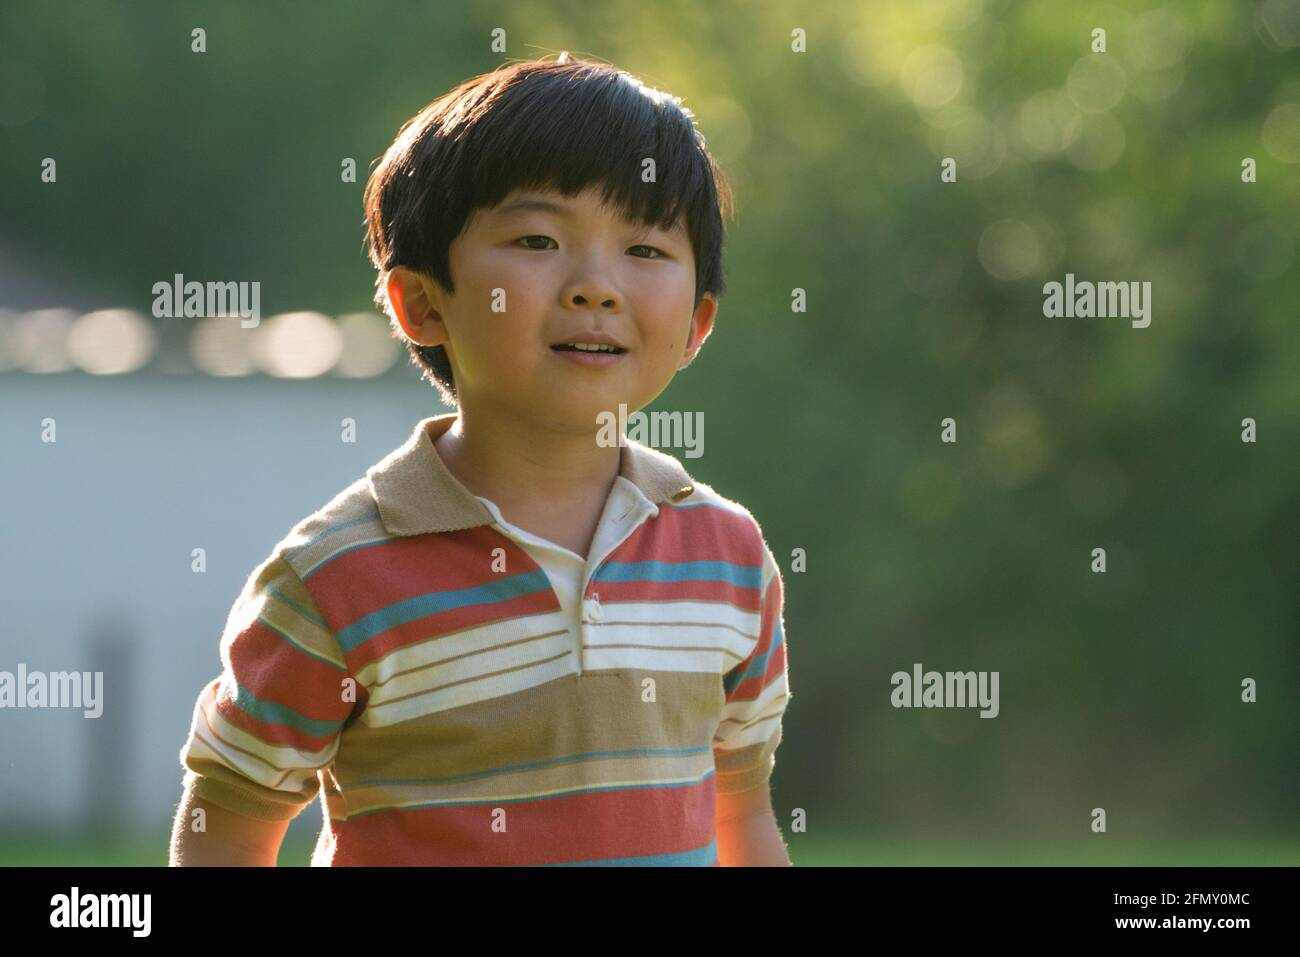 Minari Jahr : 2020 USA Regie : Lee Isaac Chung Alan S. Kim Stockfoto